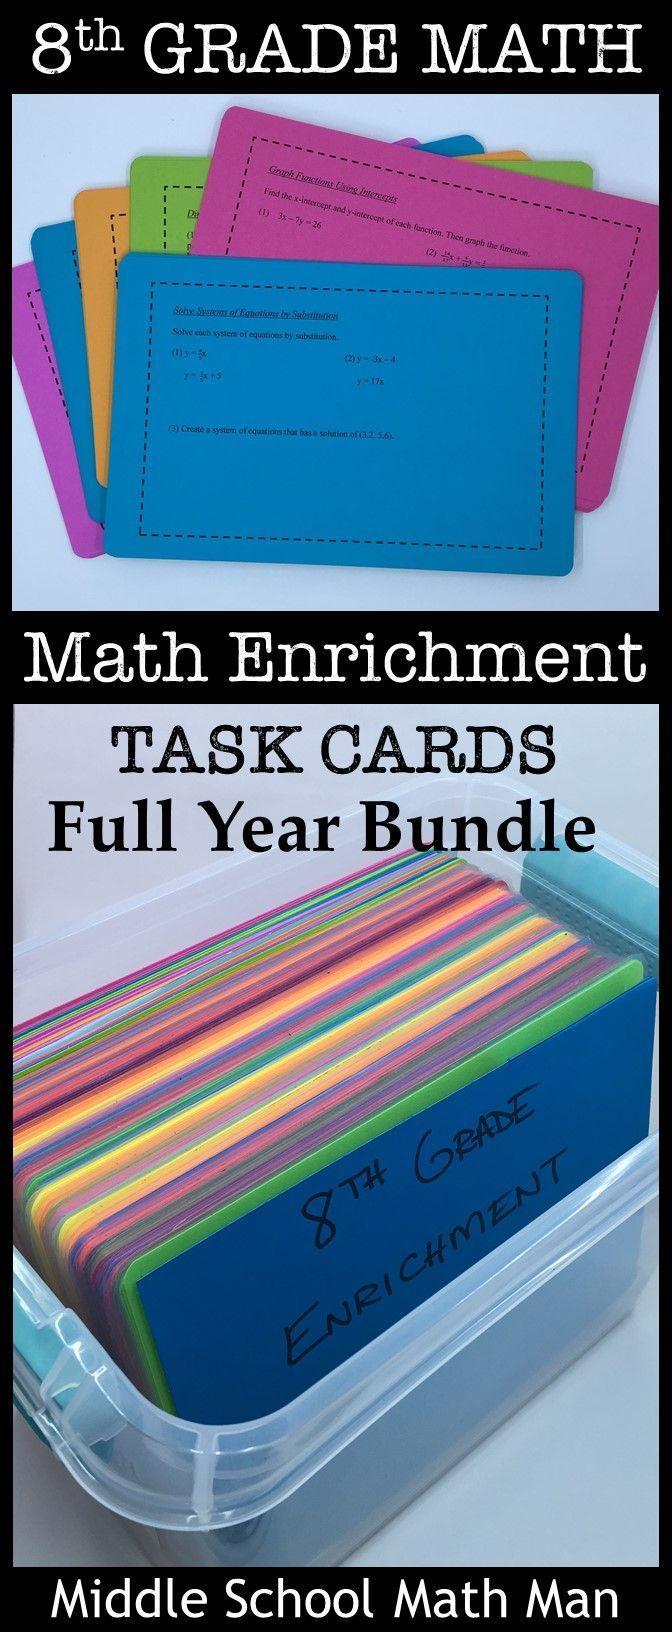 8th Grade Math Enrichment Task Cards Full Year Bundle | 8th Grade ...